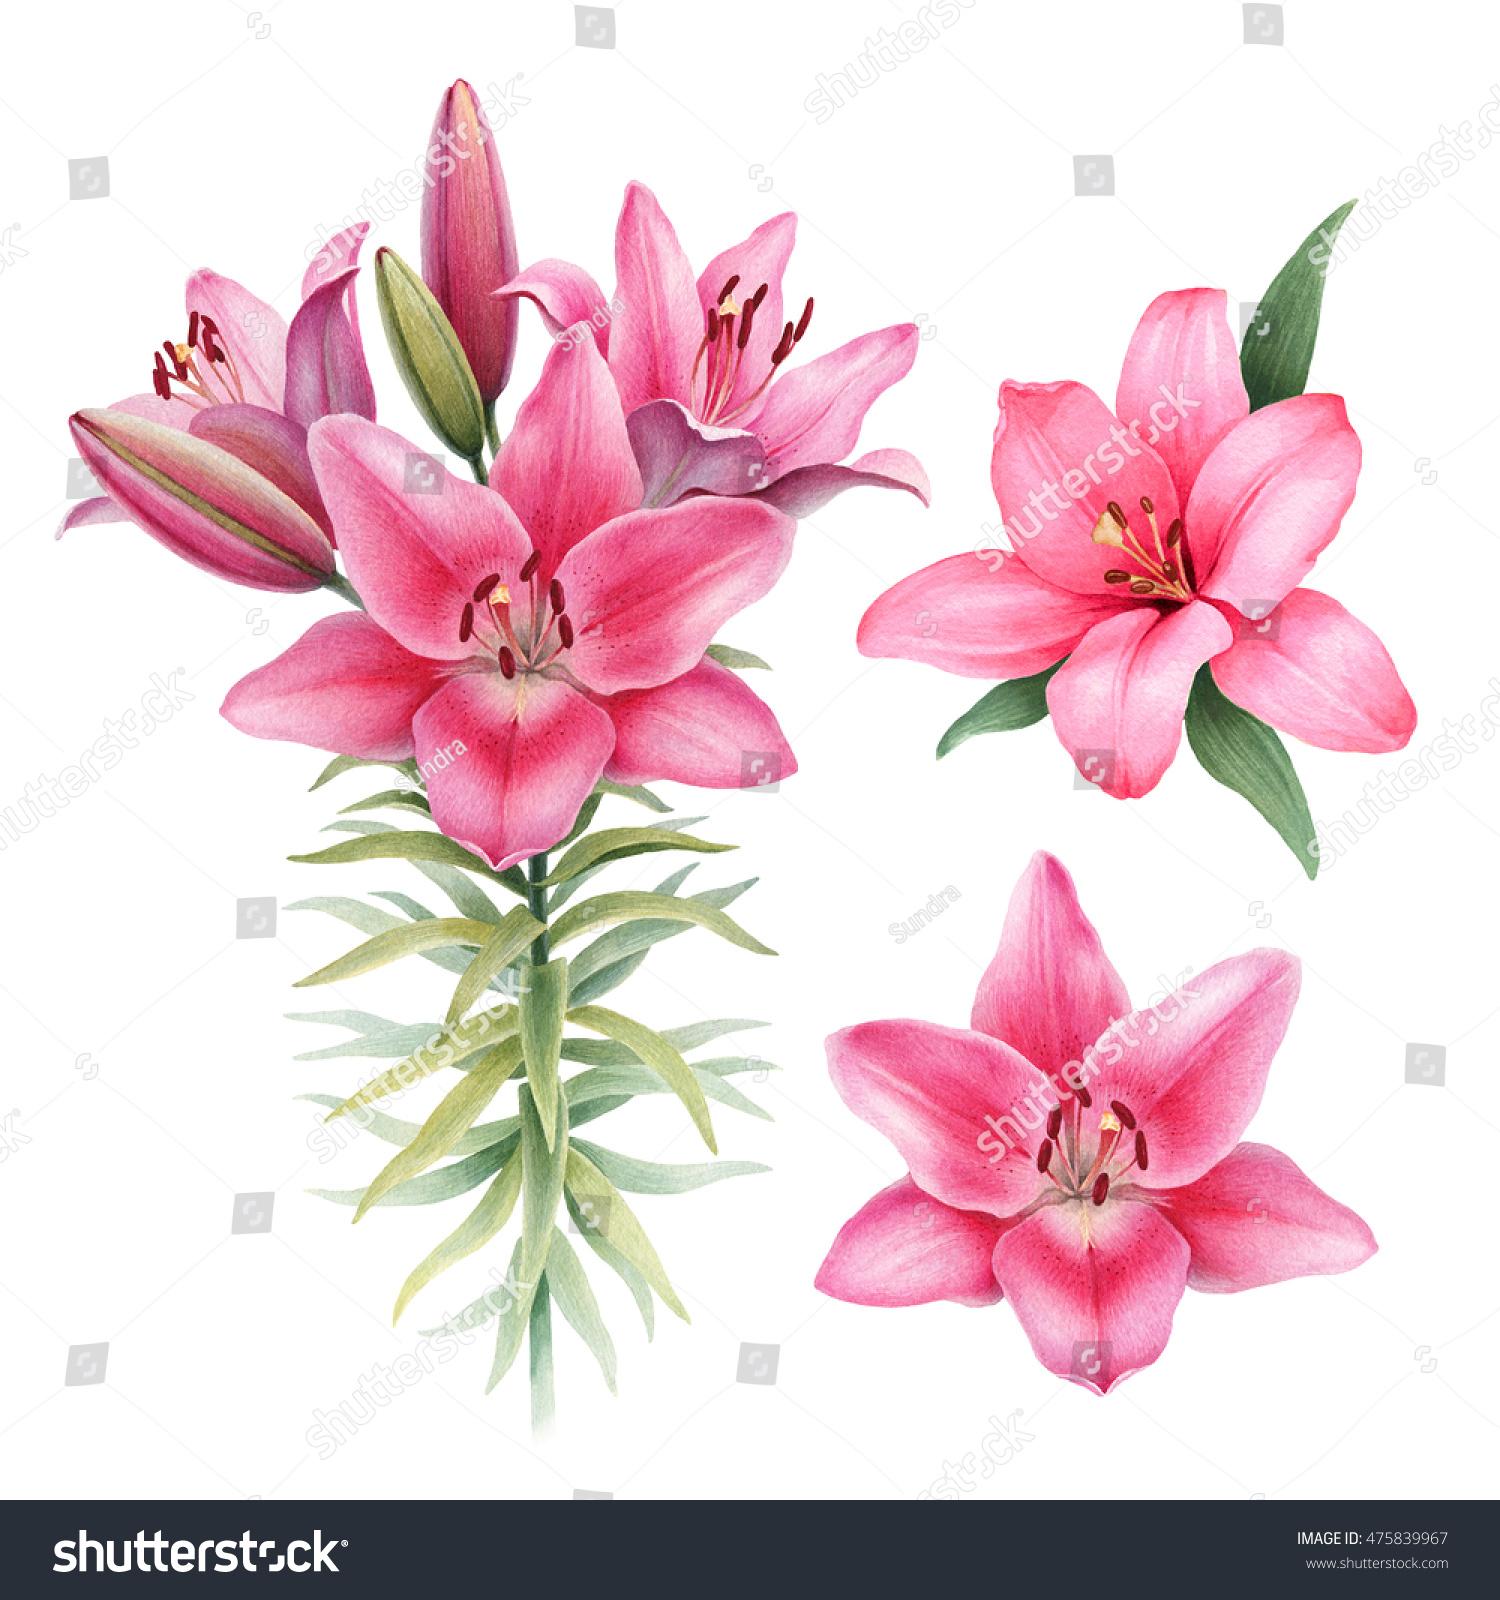 Watercolor illustrations lily flowers stock illustration 475839967 watercolor illustrations of lily flowers izmirmasajfo